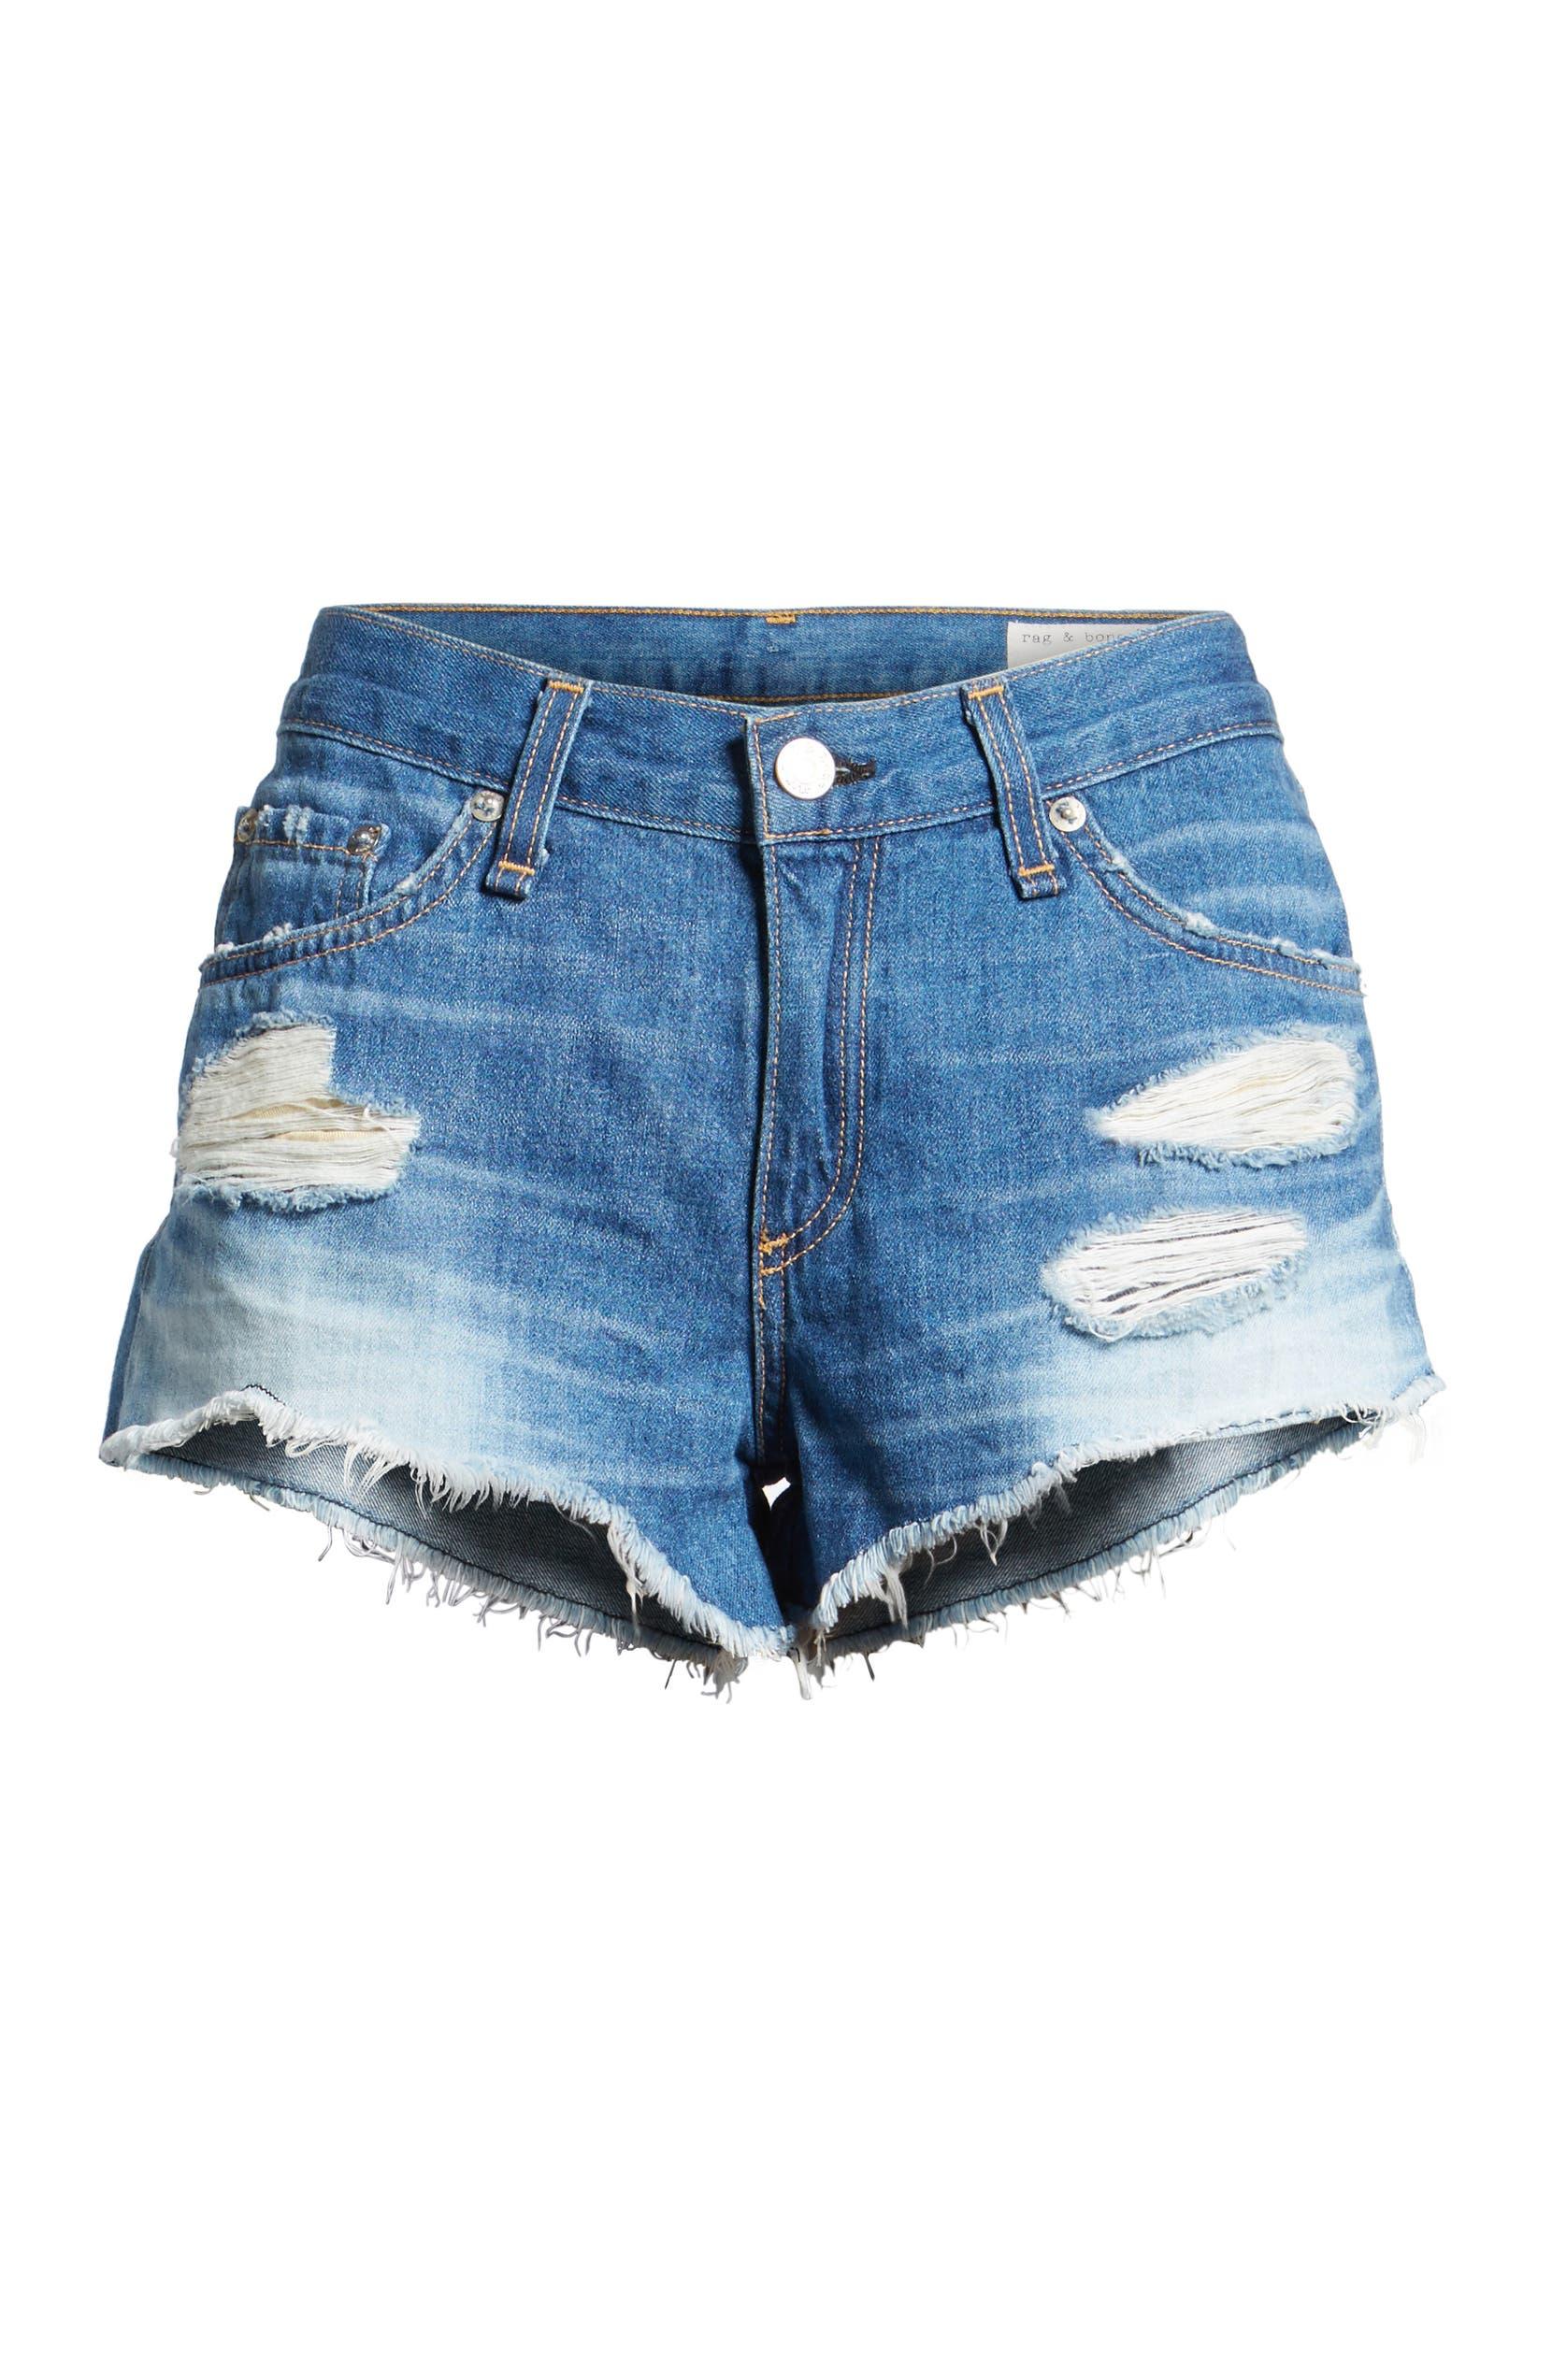 e167ed8c 'The Cutoff' Denim Shorts